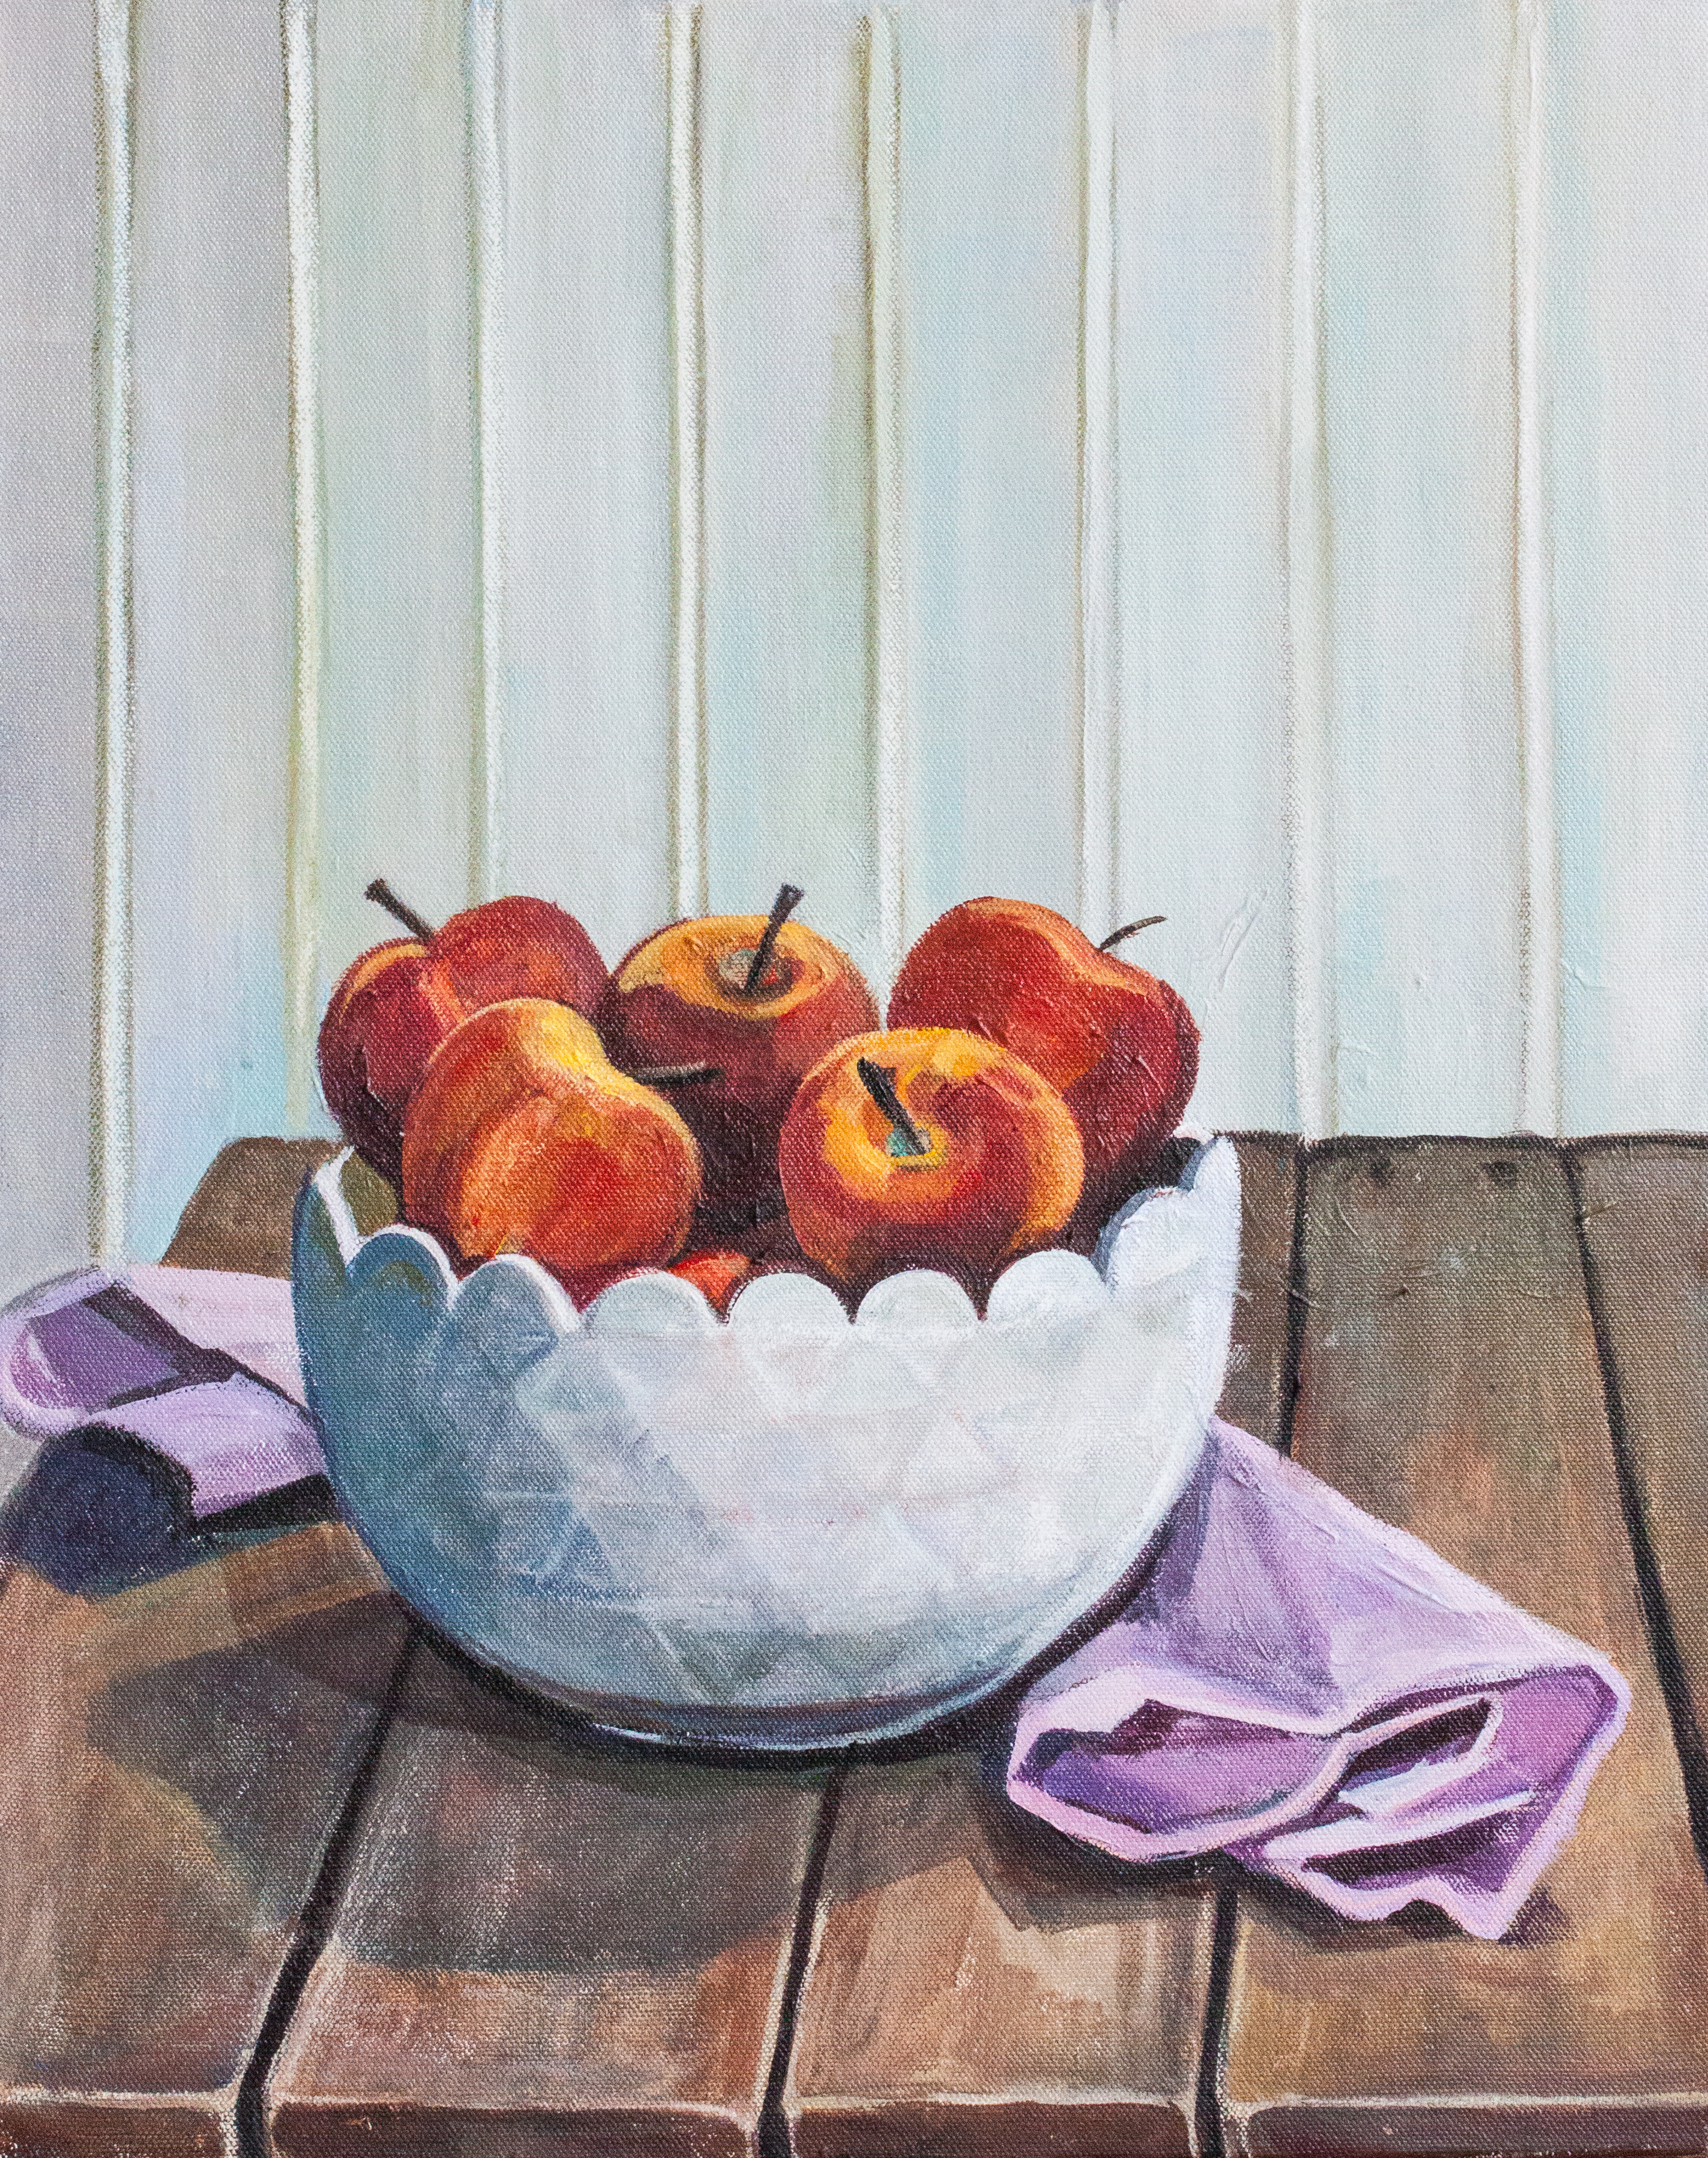 Apples. Acrylic on Canvas. Allyson Kramer, 2015